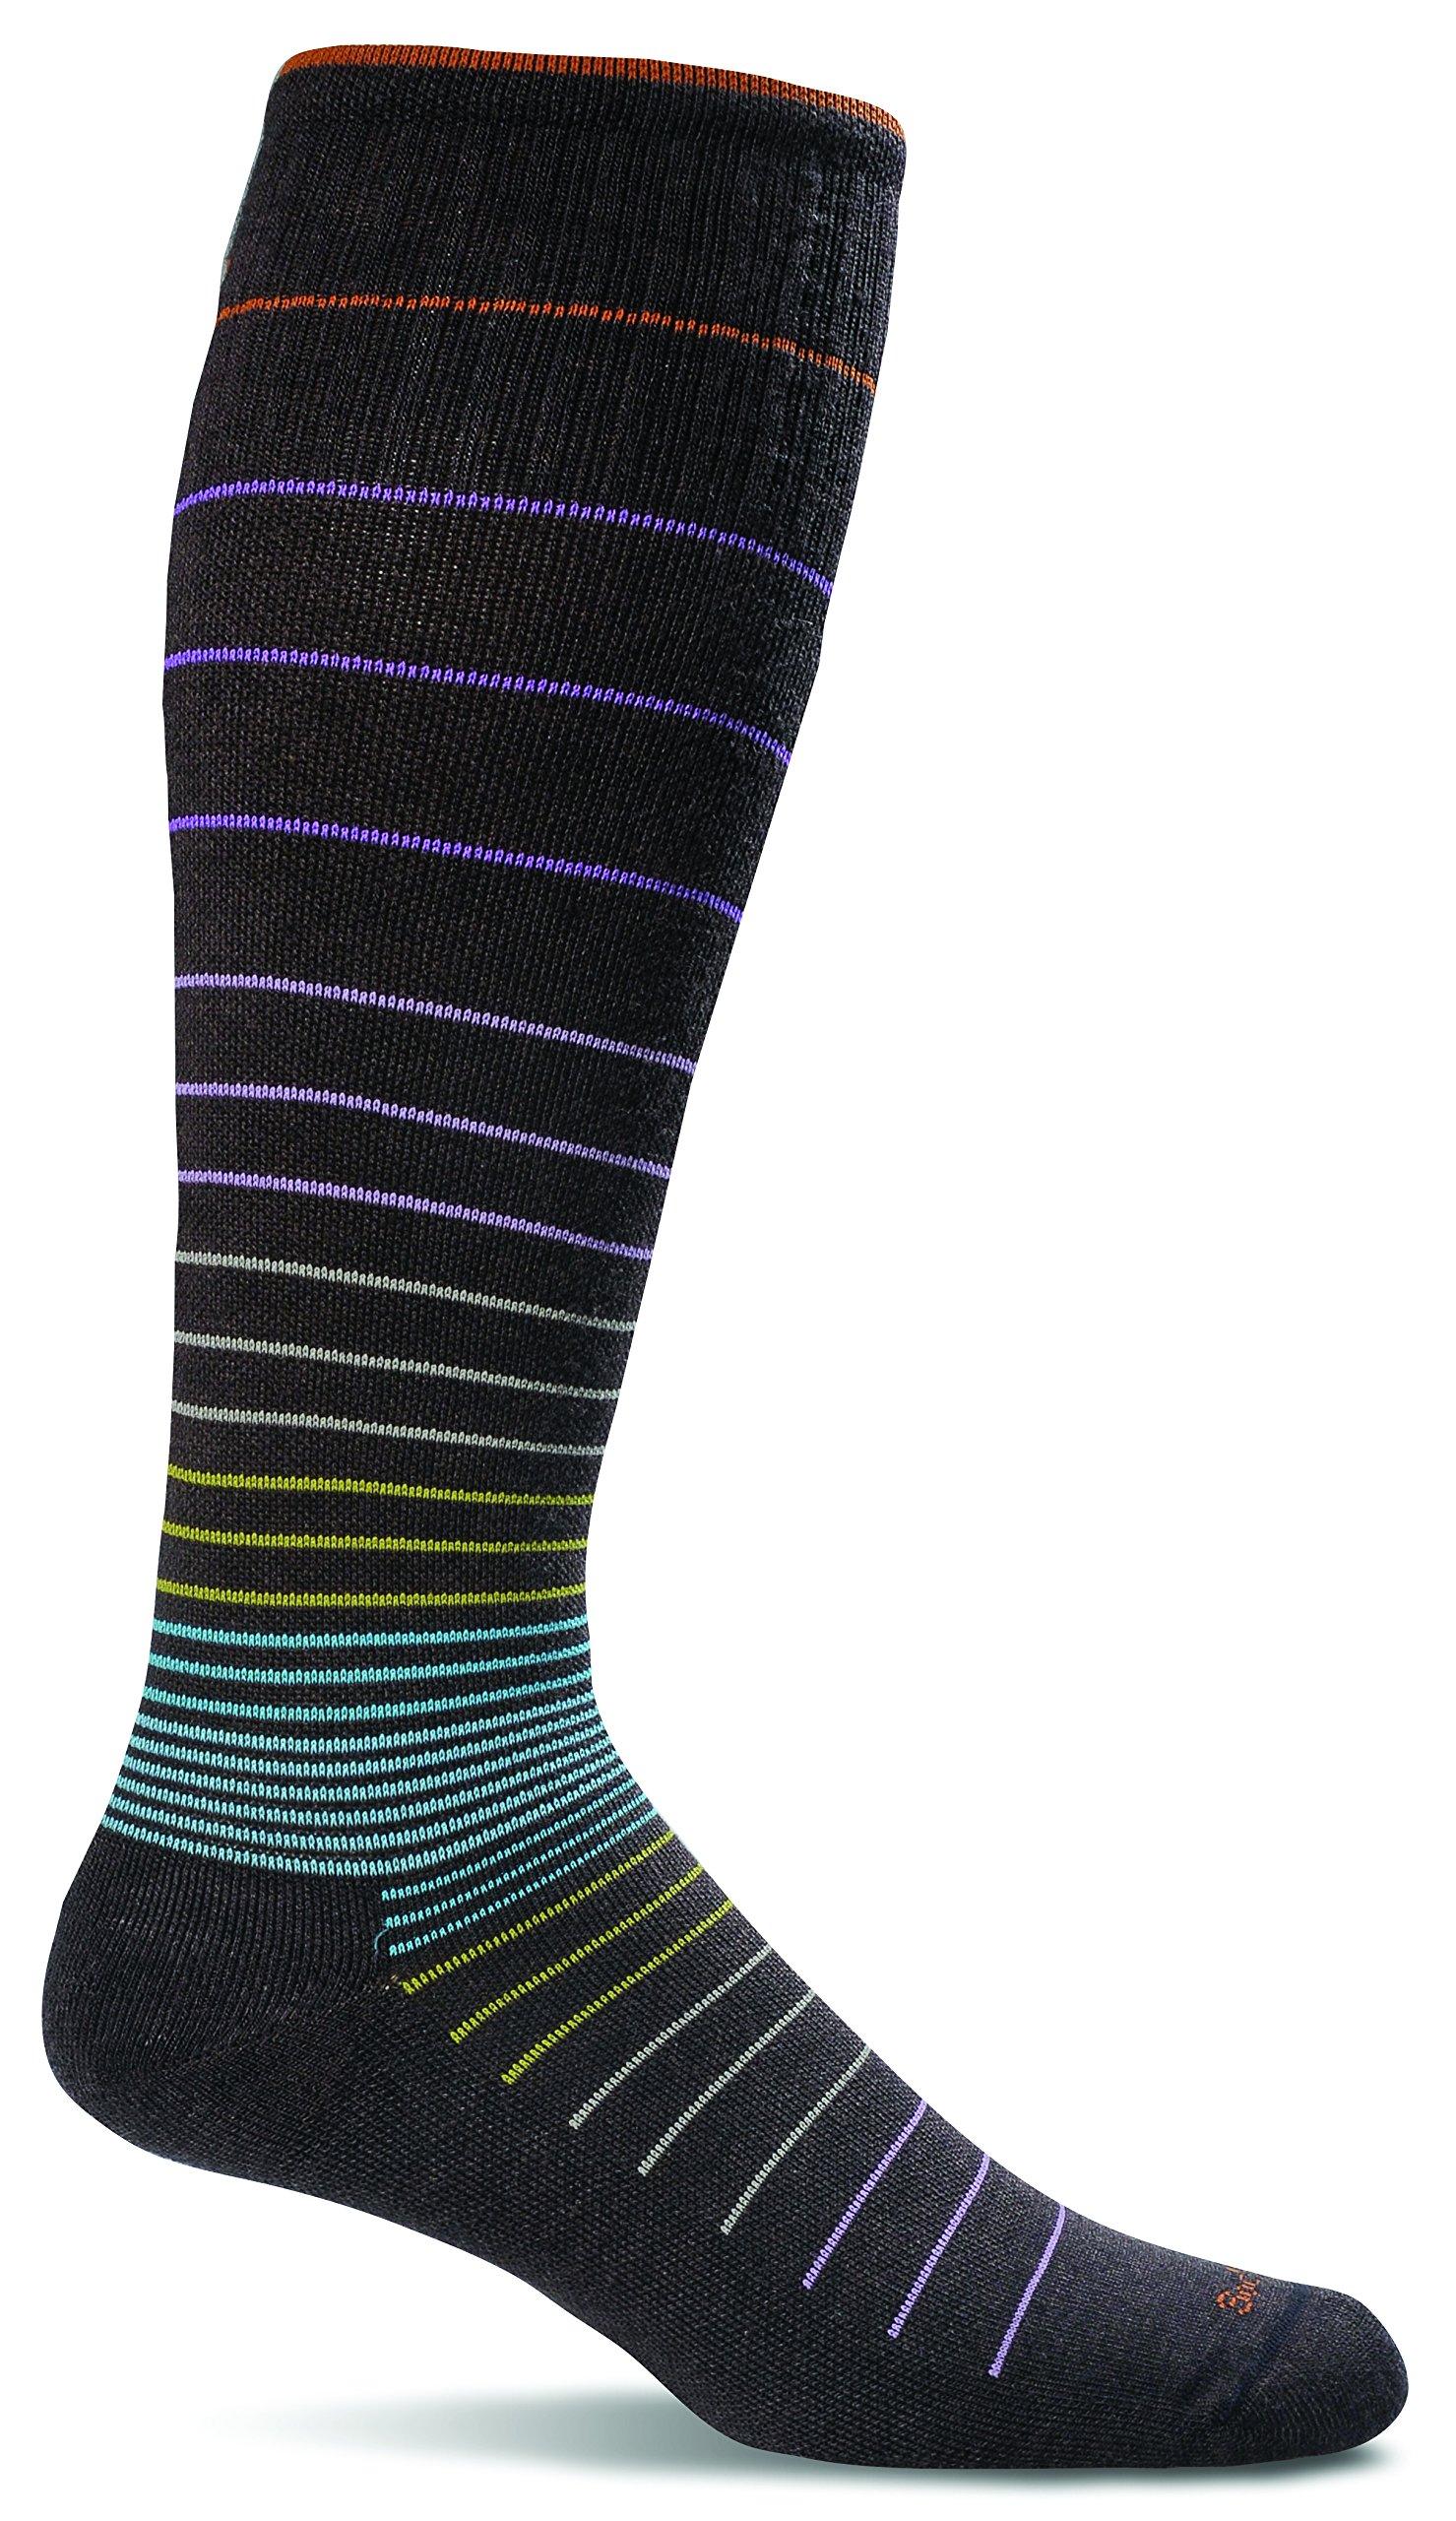 Sockwell Women's Circulator Graduated Compression Socks, Small/Medium (4-7.5), Espresso